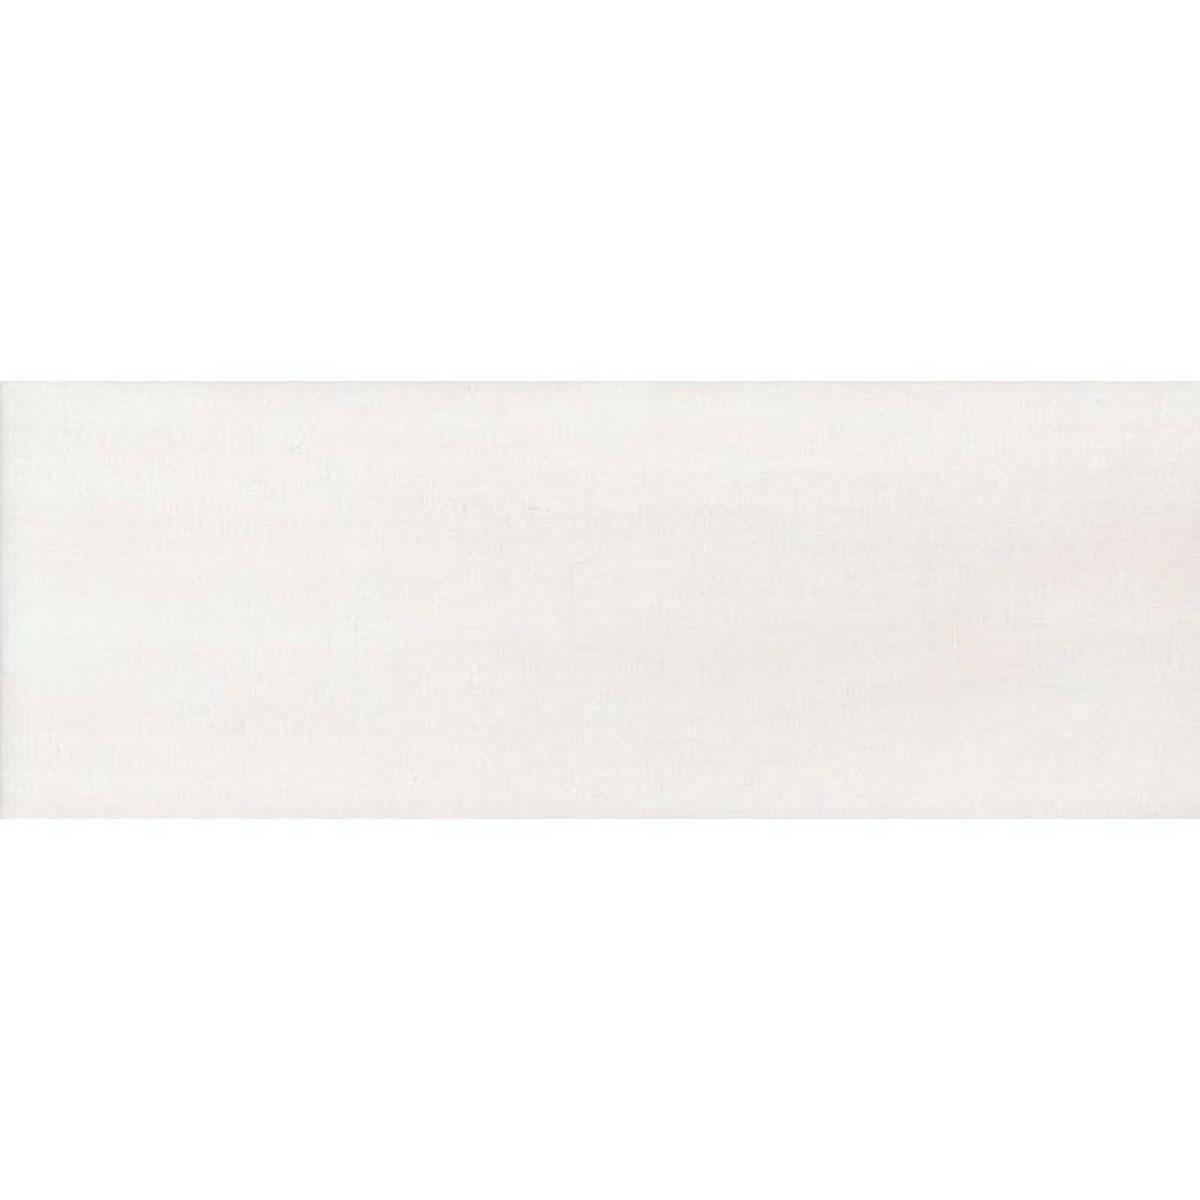 Плитка настенная Ньюпорт цвет бежевый 15х40 см 132 м2